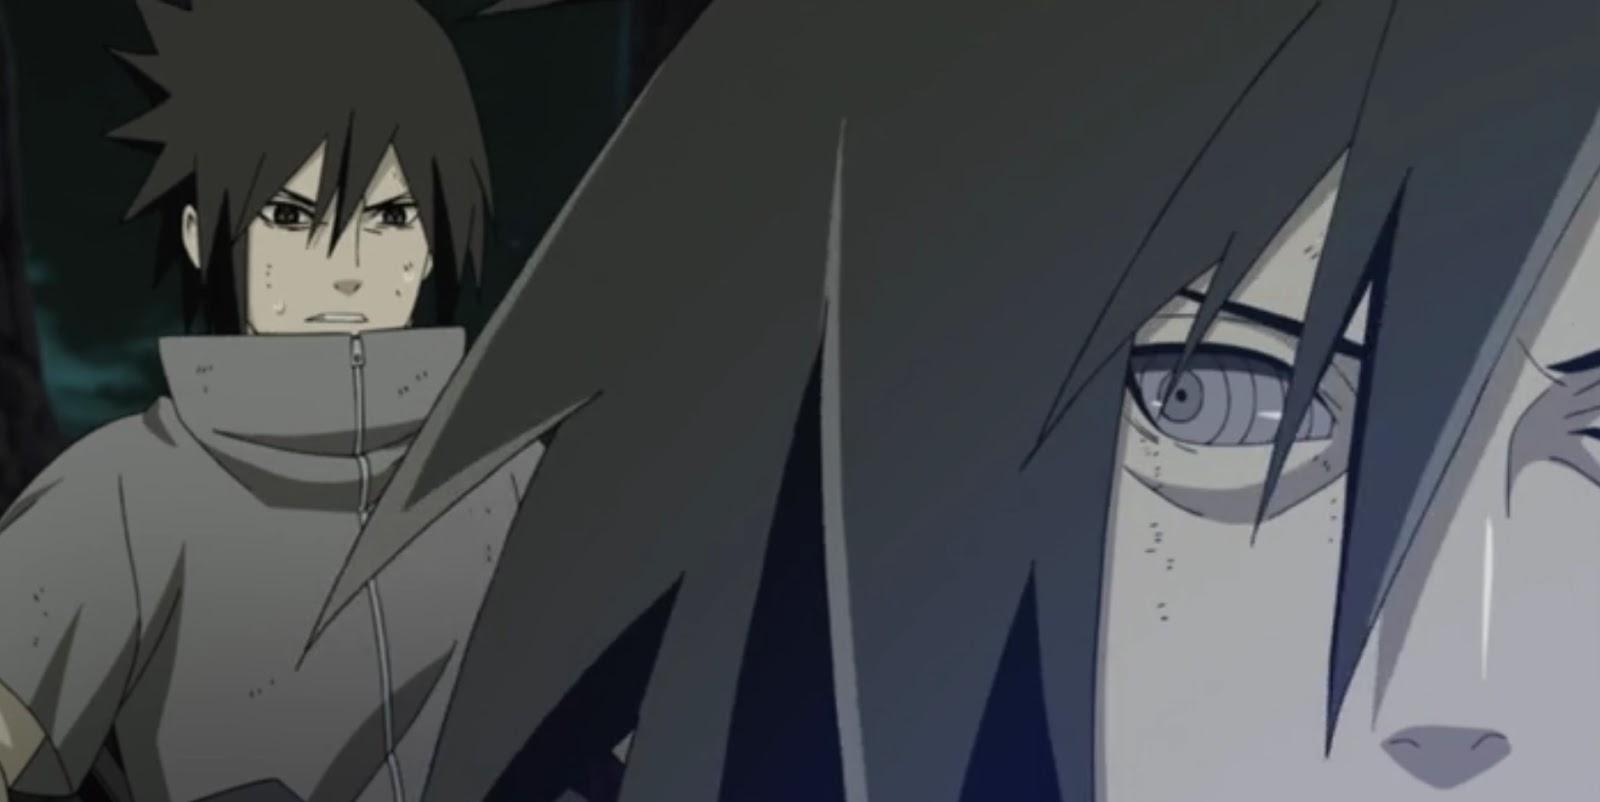 Naruto Shippuden: Episódio 393 – O Verdadeiro Fim